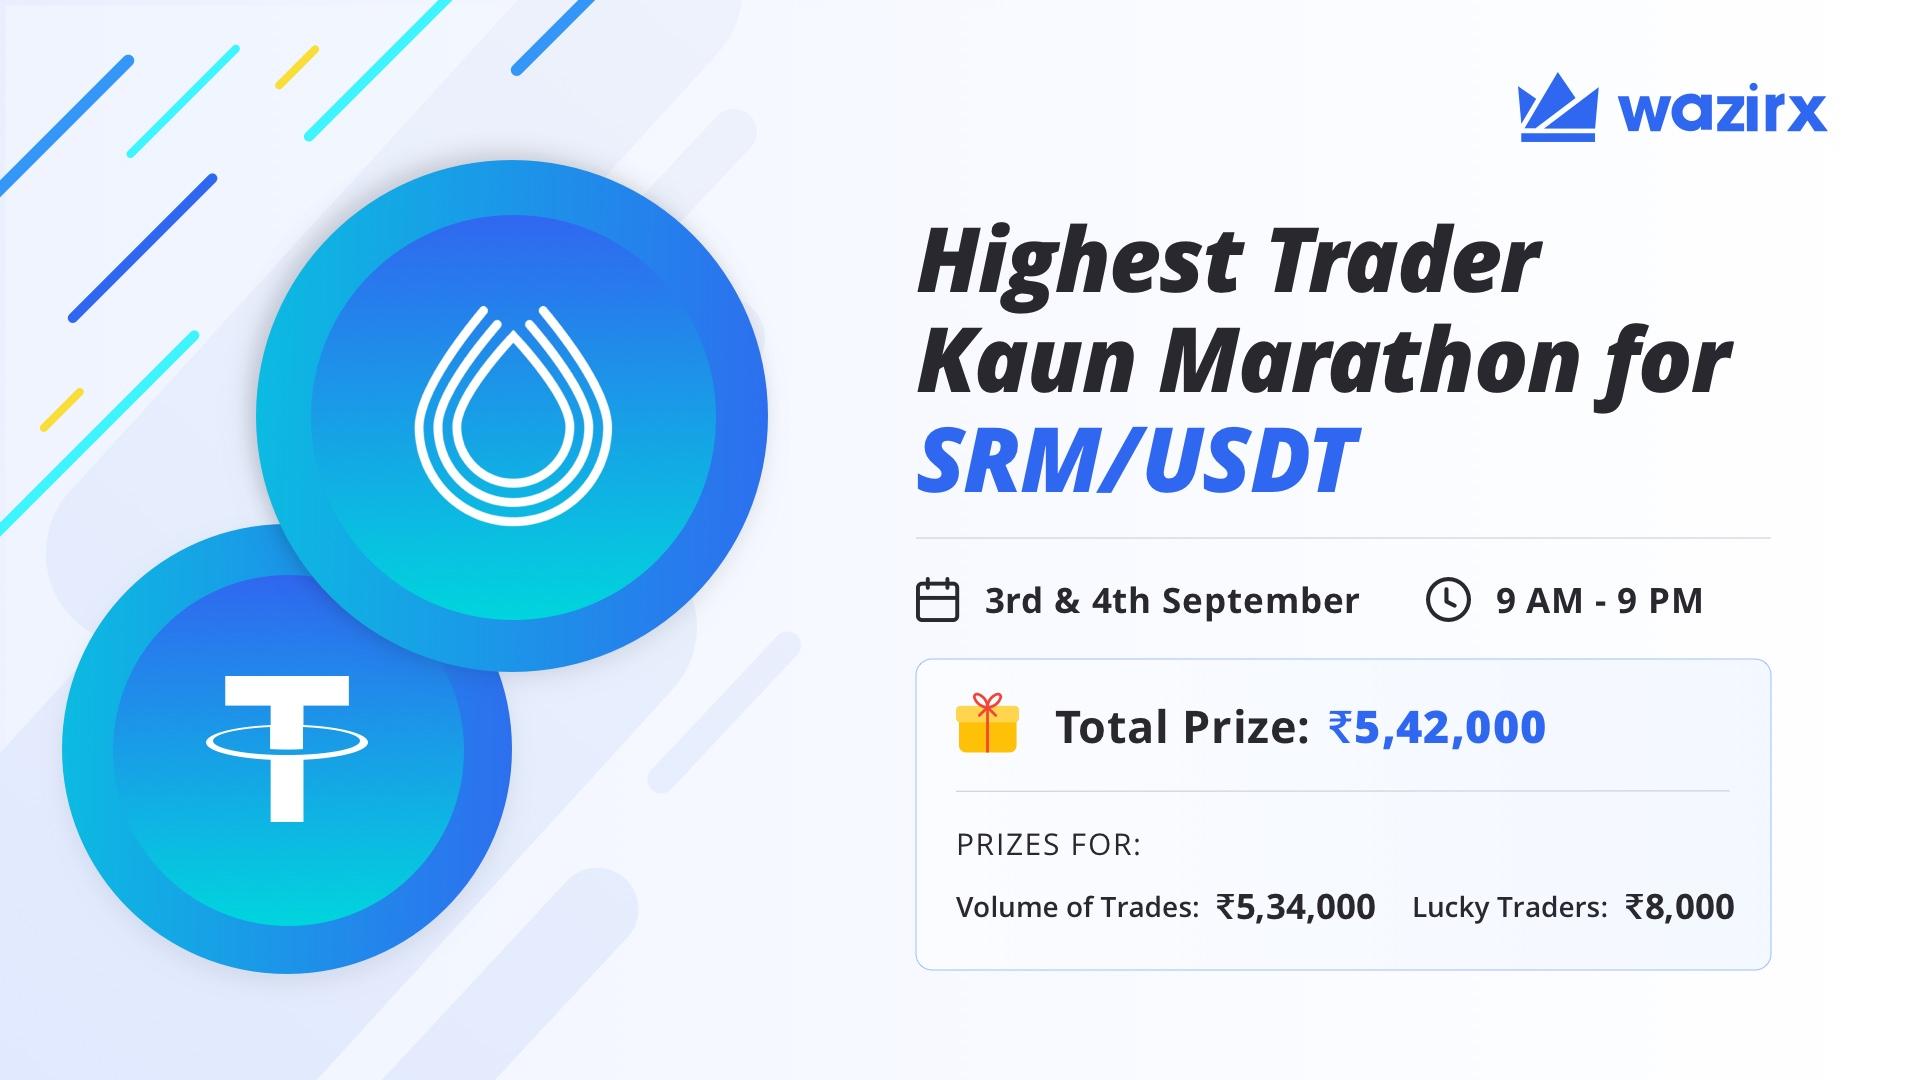 Highest Trader Kaun Marathon: SRM/USDT